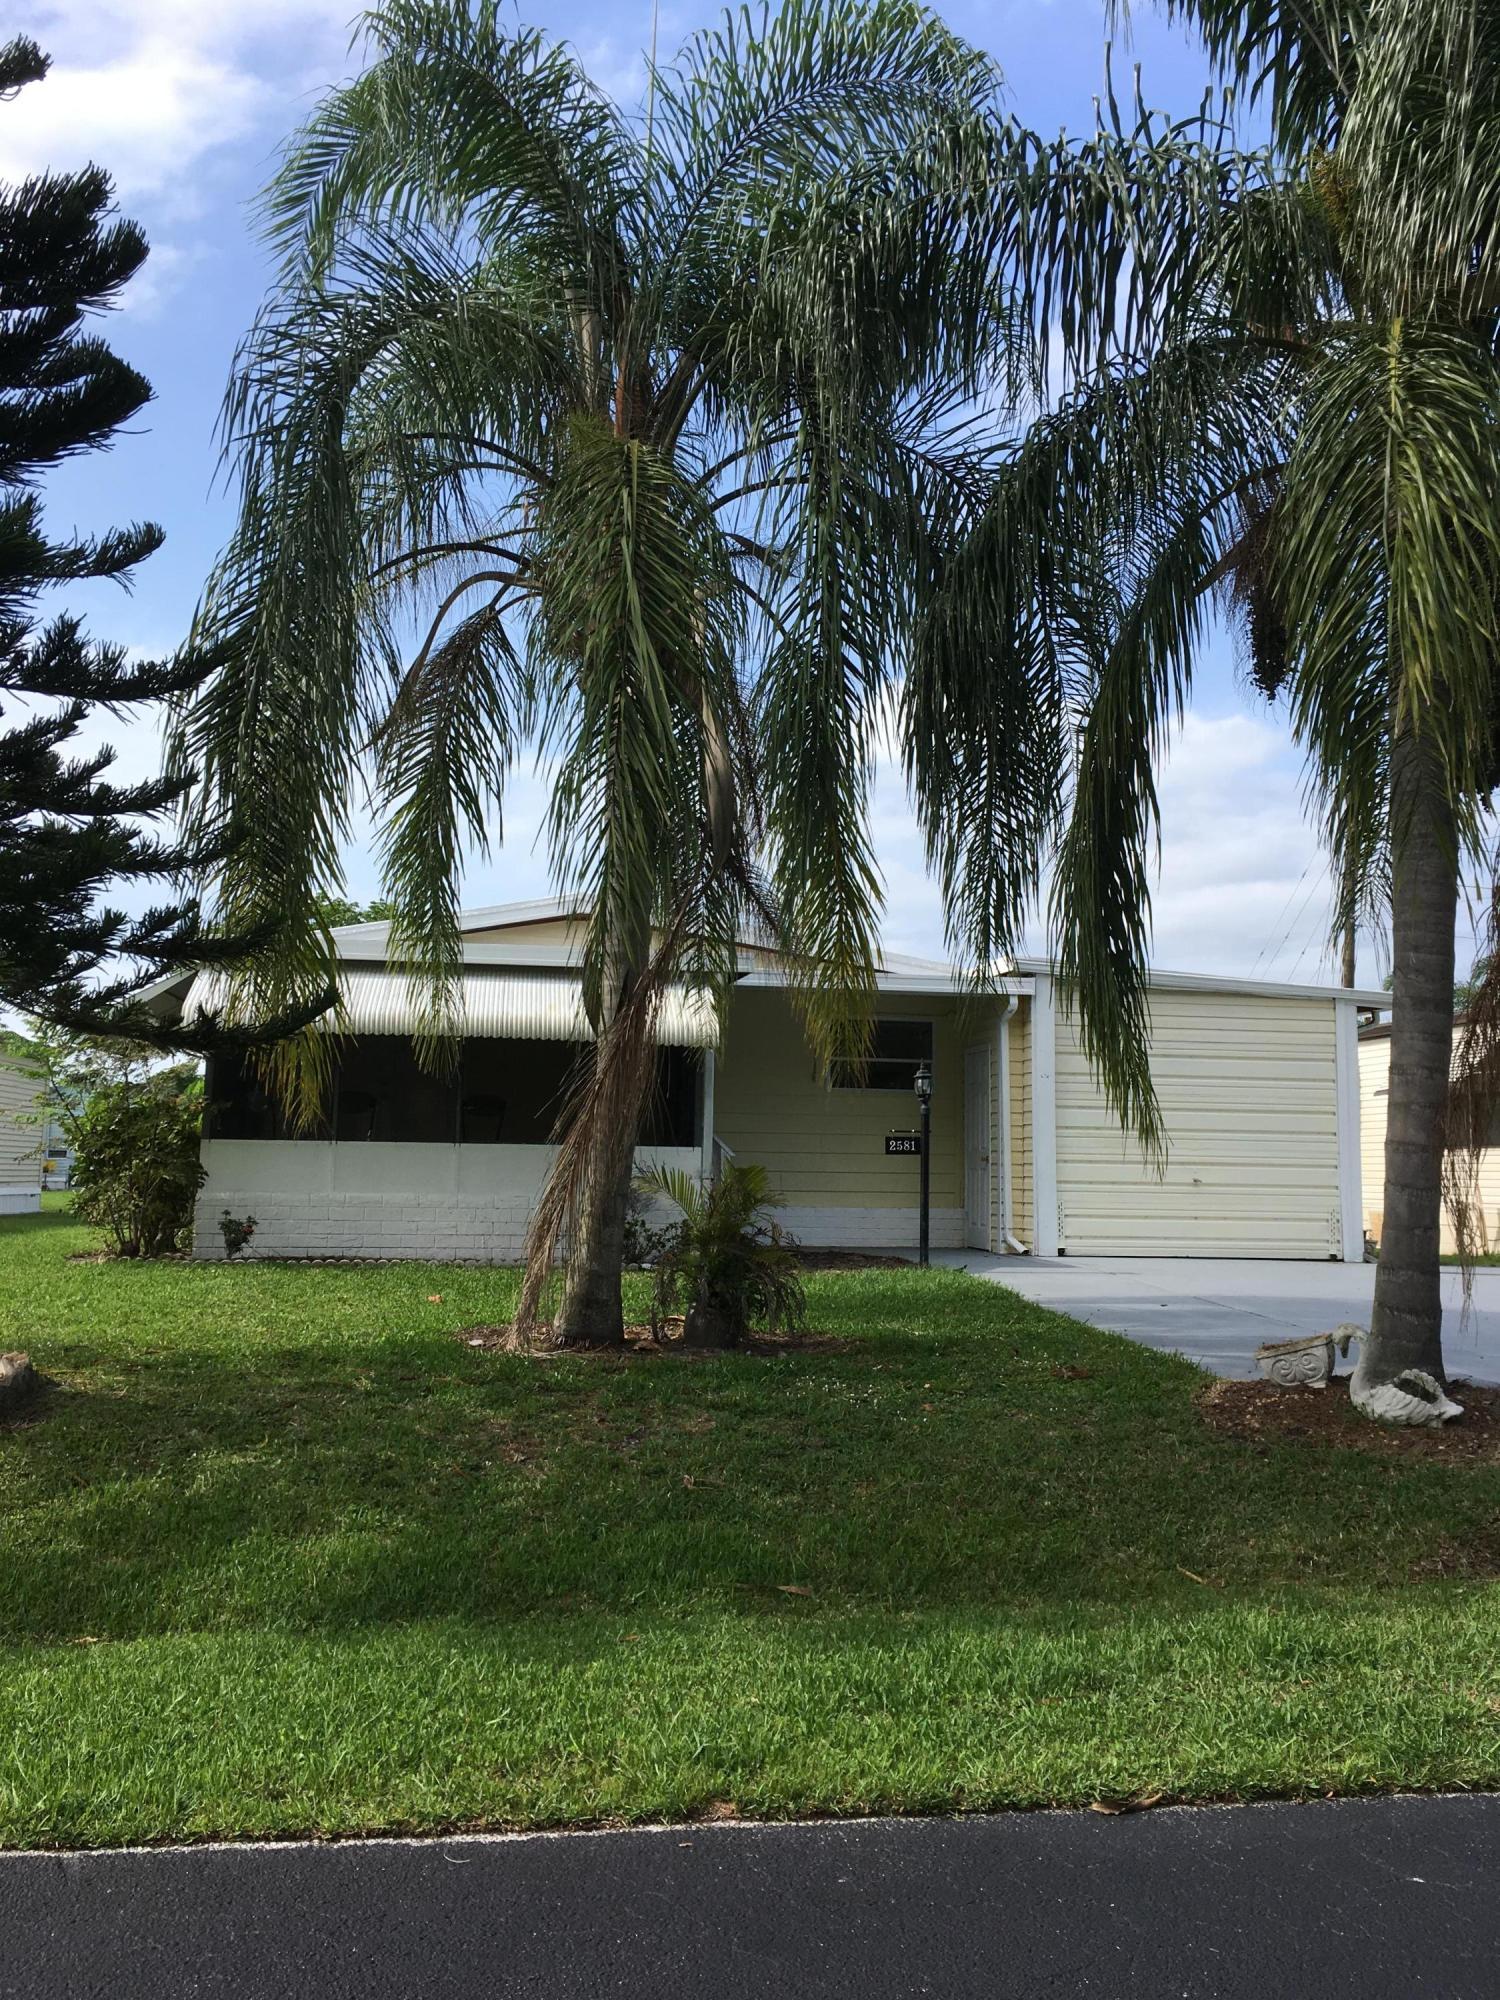 2581 Pontiac Place, Stuart, Florida 34997, 2 Bedrooms Bedrooms, ,2 BathroomsBathrooms,A,Mobile/manufactured,Pontiac,RX-10530783